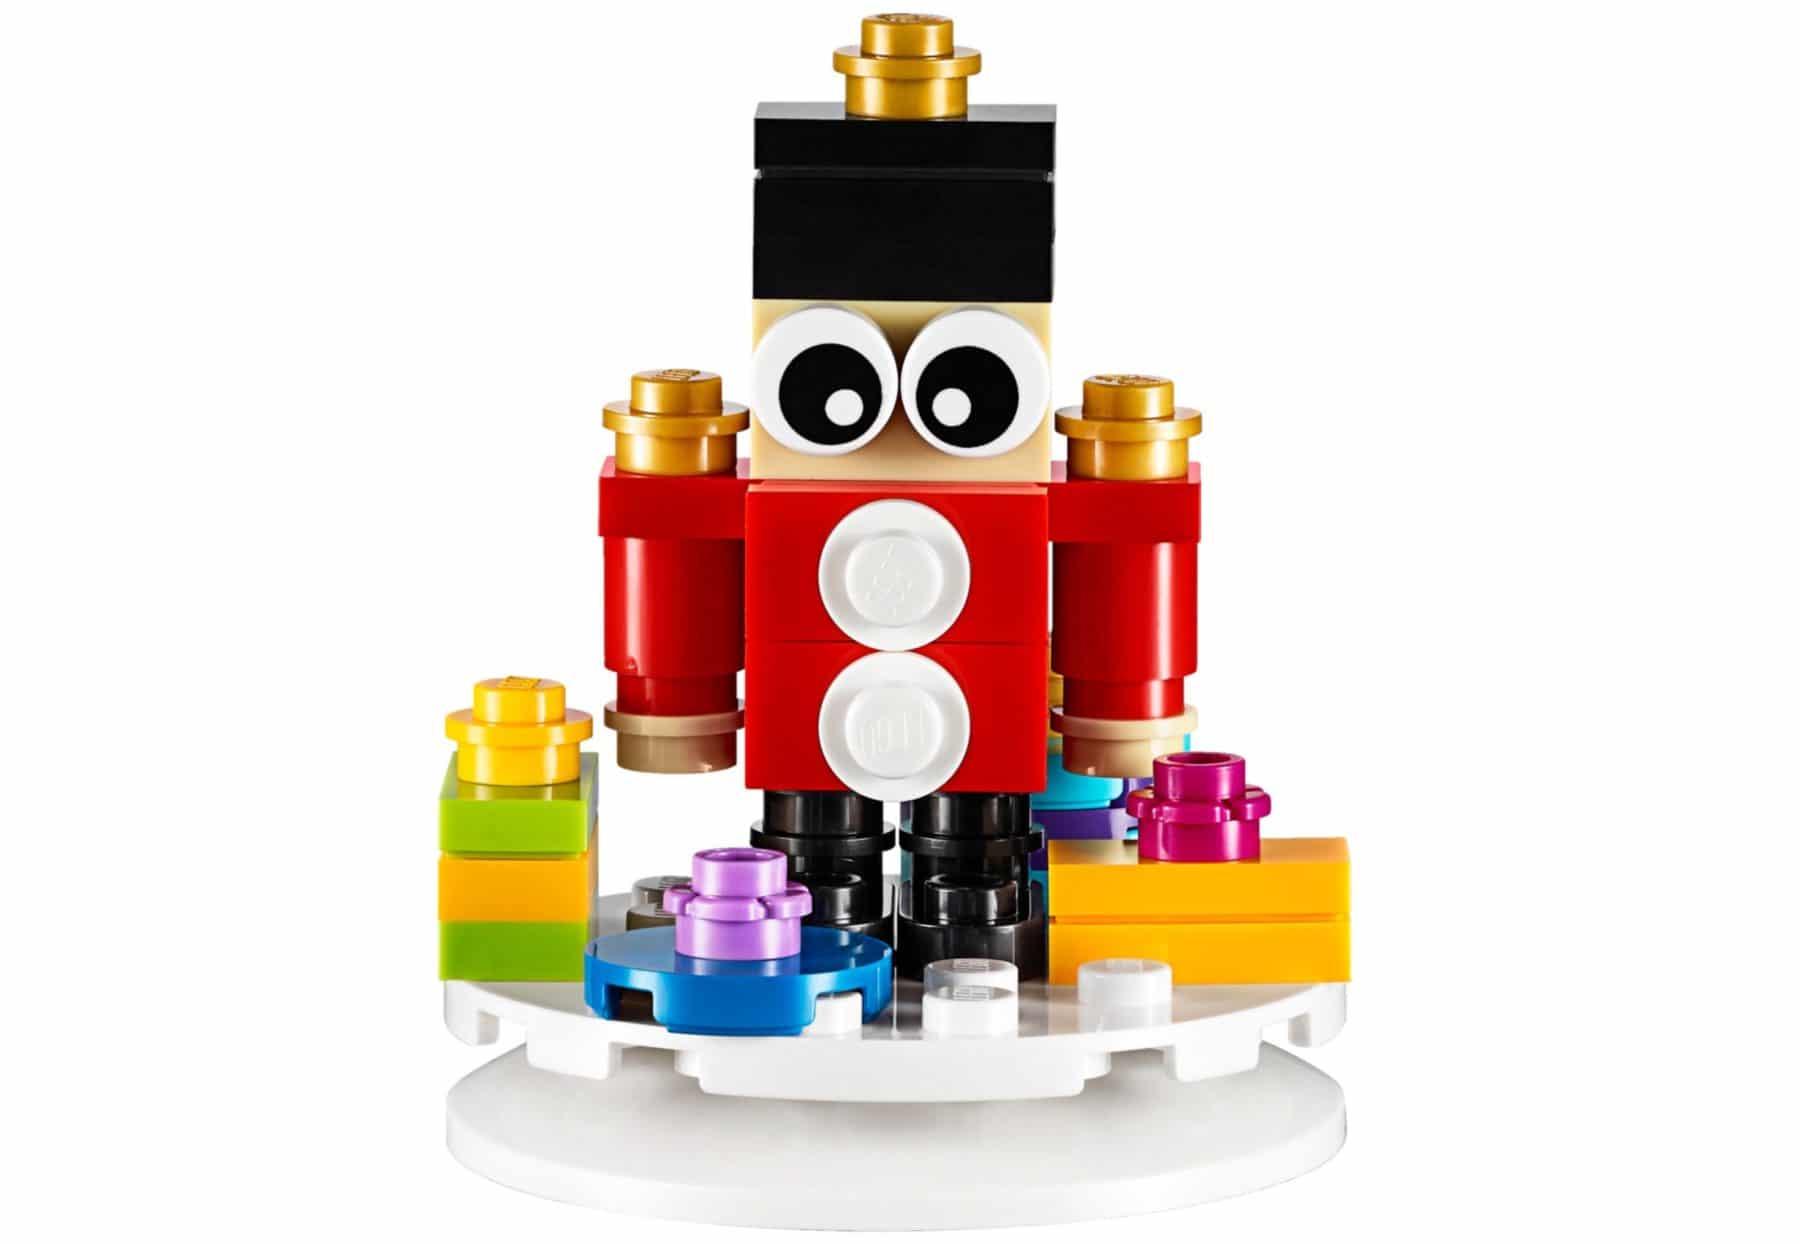 LEGO 853907 Spielzeugsoldat Christbaumschmuck